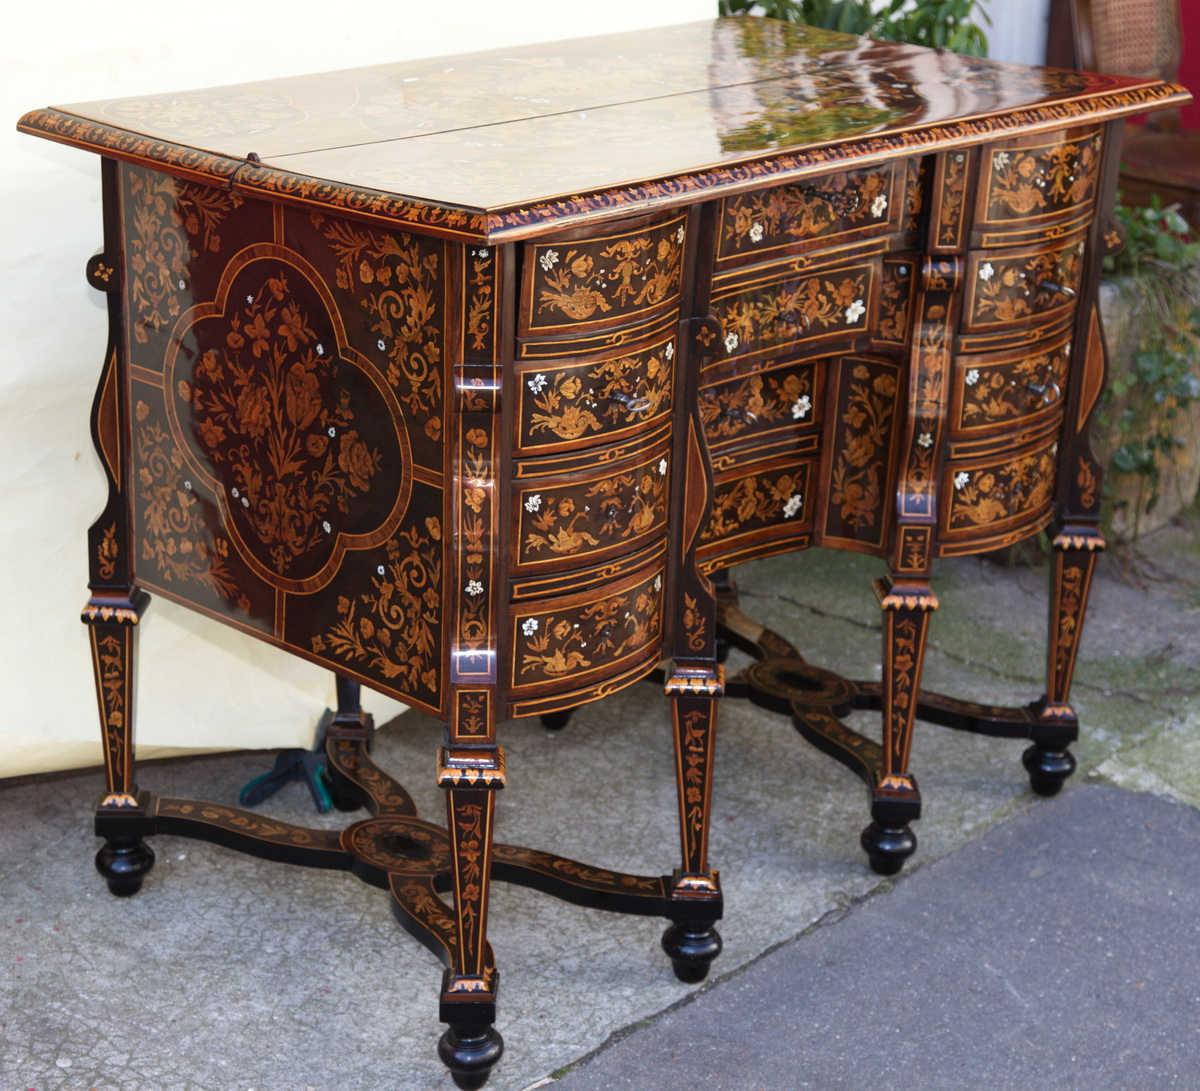 bureau mazarin style louis xiv milieu xix. Black Bedroom Furniture Sets. Home Design Ideas